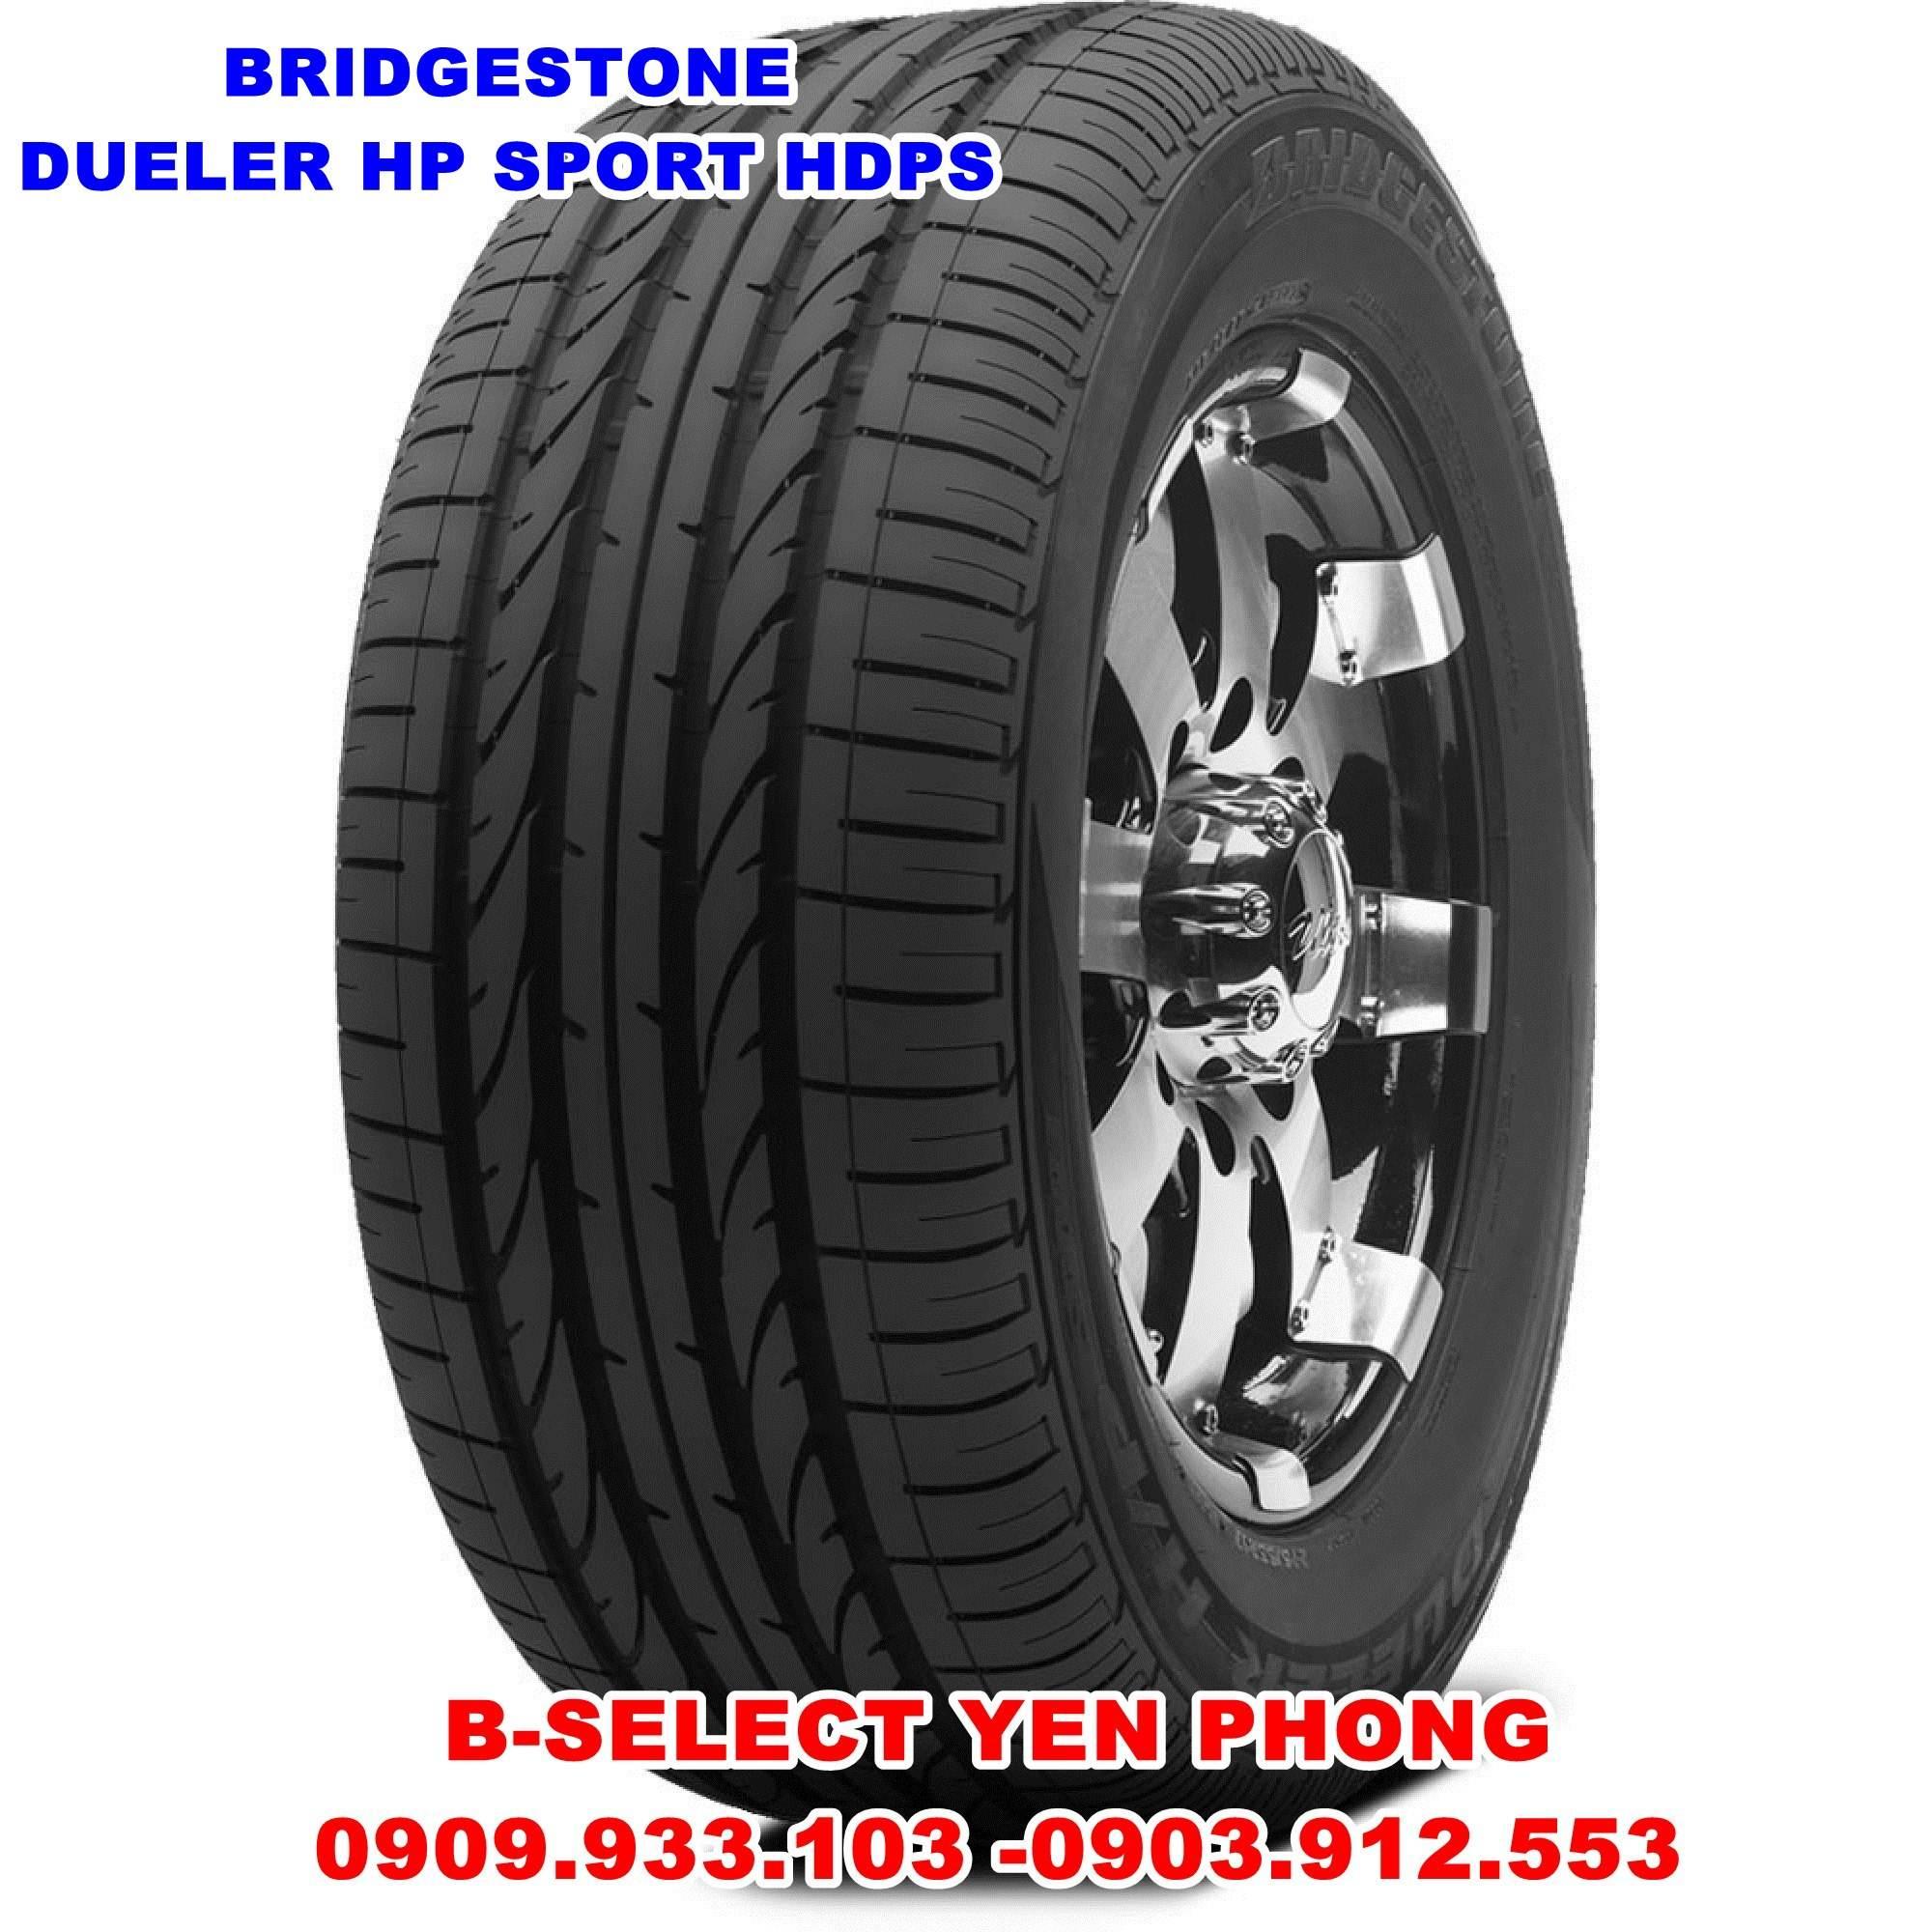 Lốp Xe Du Lịch Bridgestone Dueler 225/60R17 DHPS